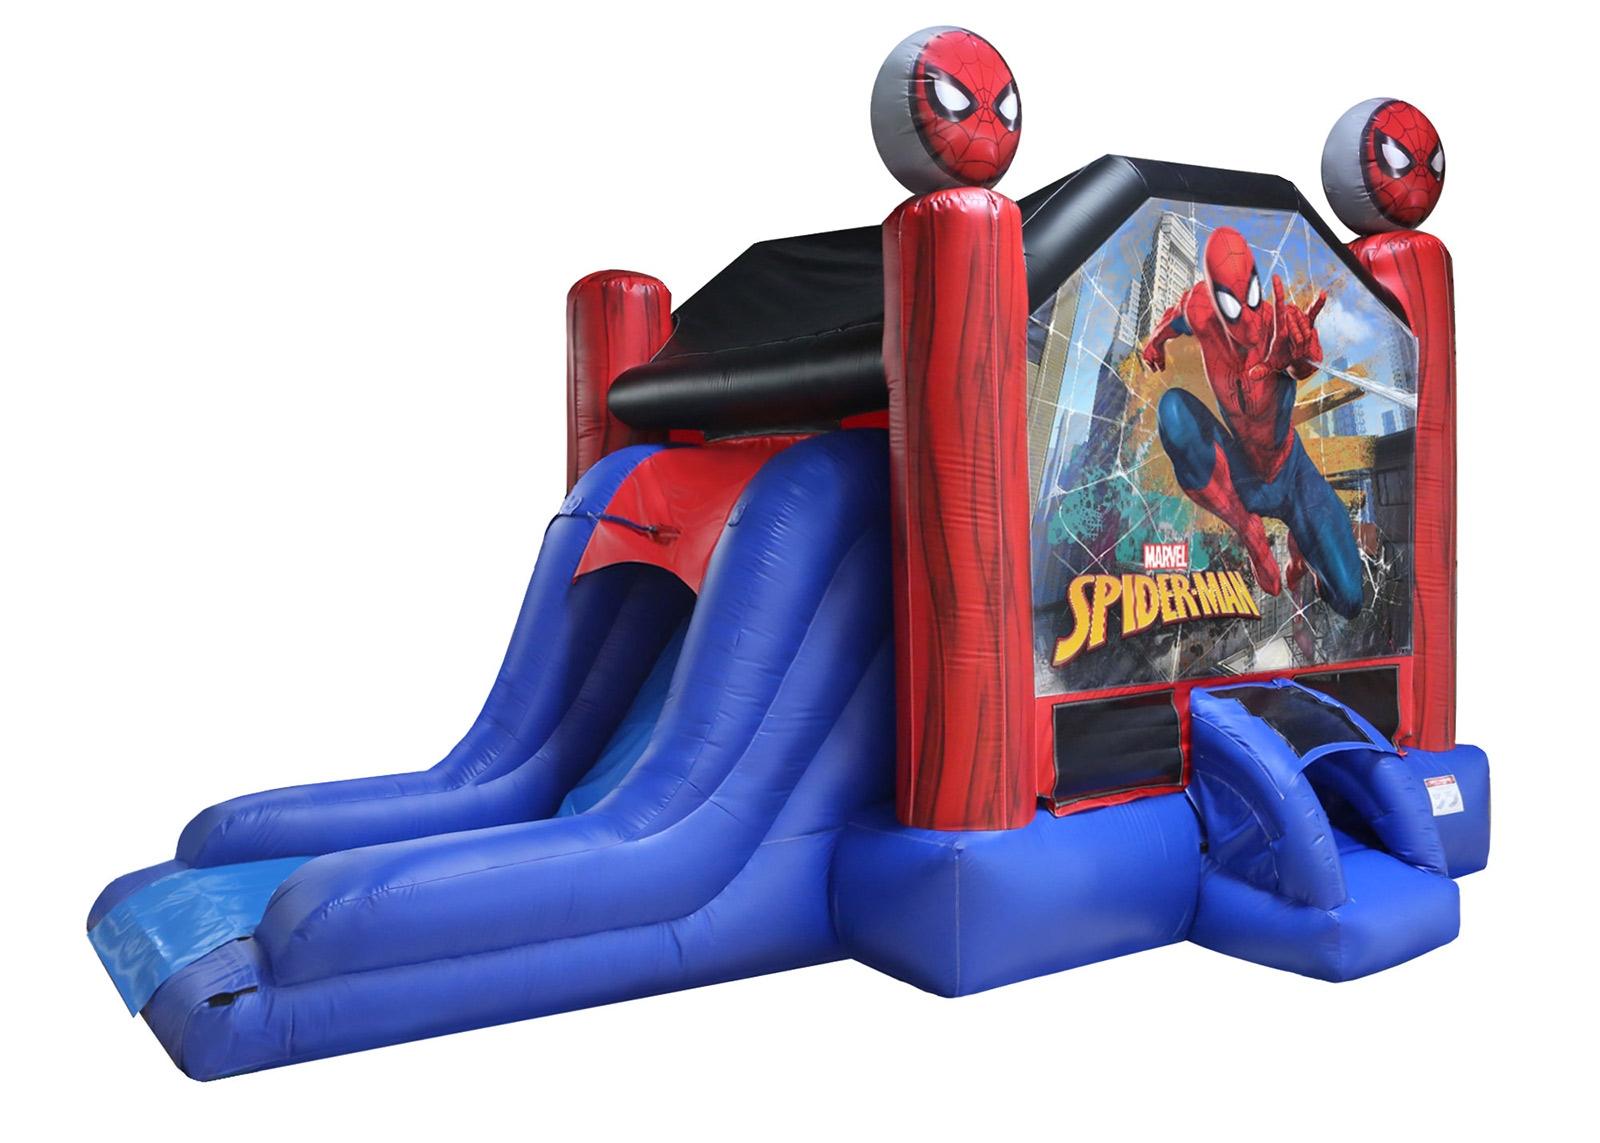 Spiderman Bounce House Combo